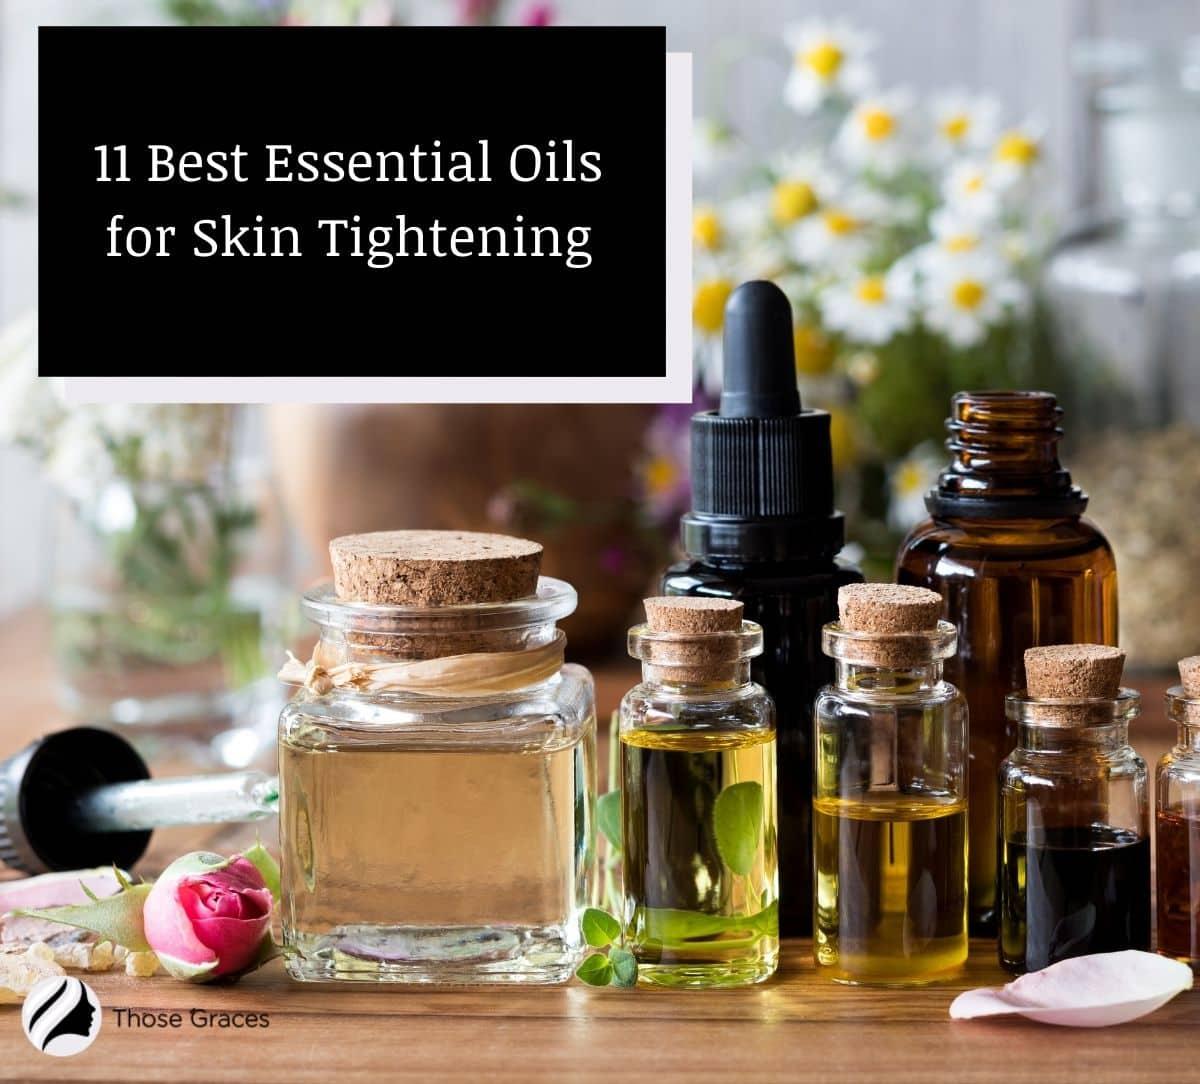 different varieties of best essential oils for skin tightening